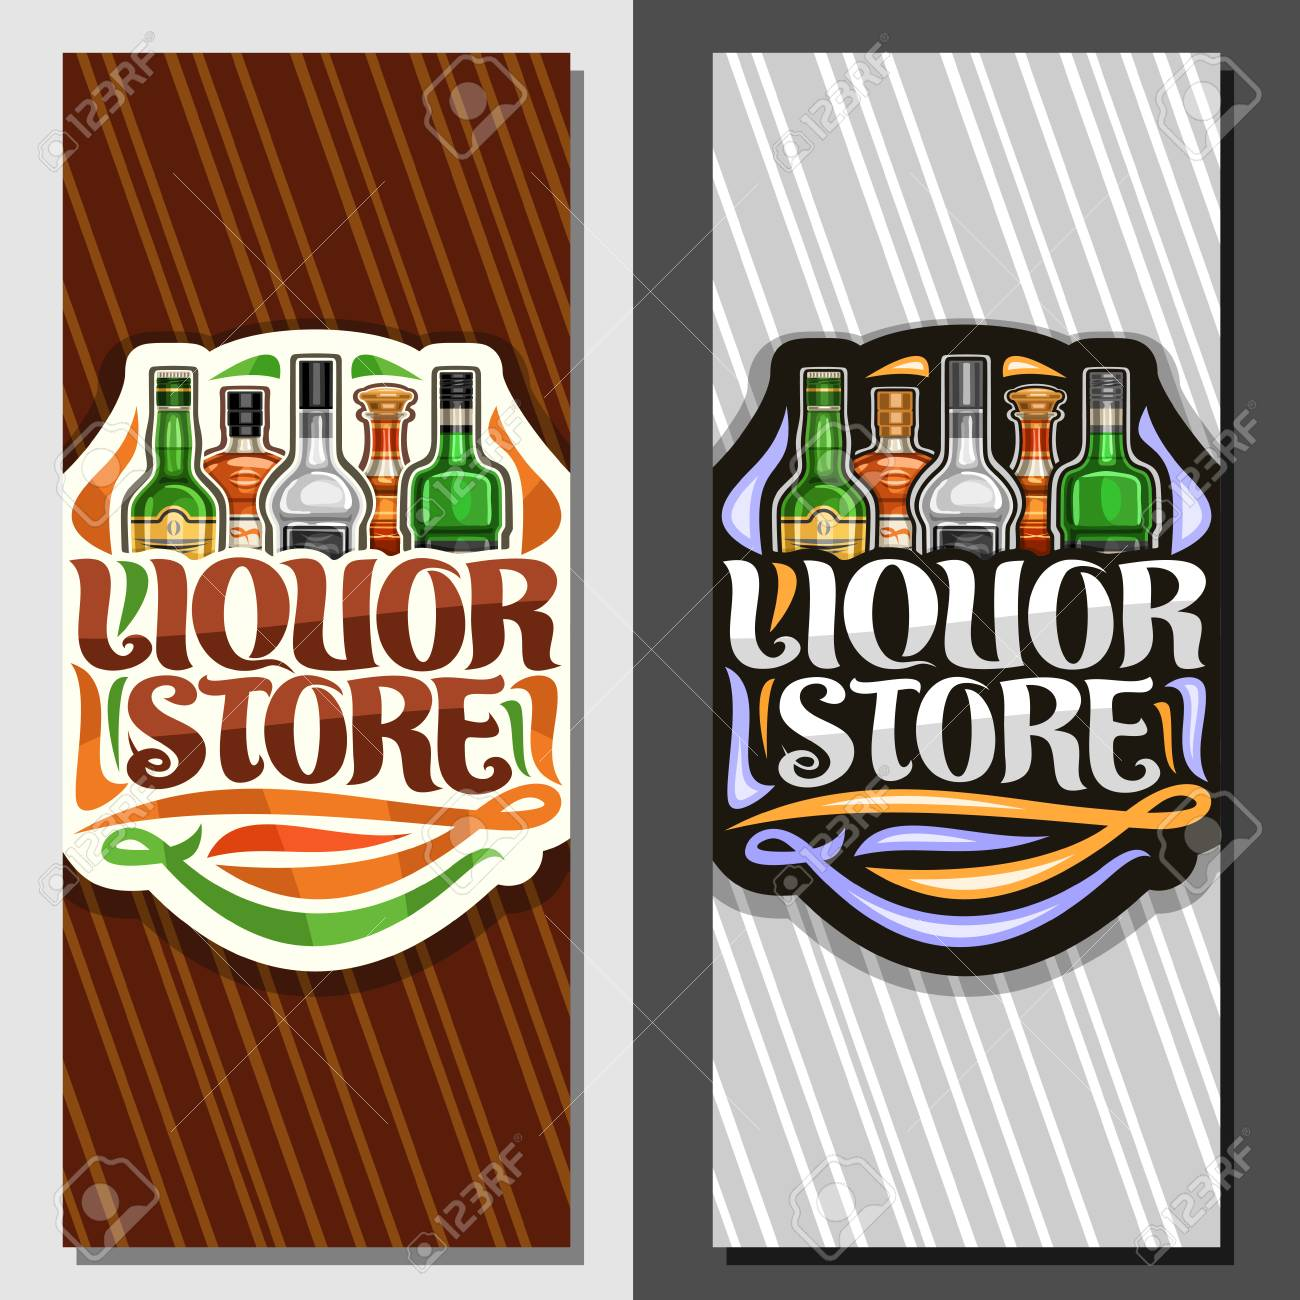 Liquor store simple powerpoint template design.